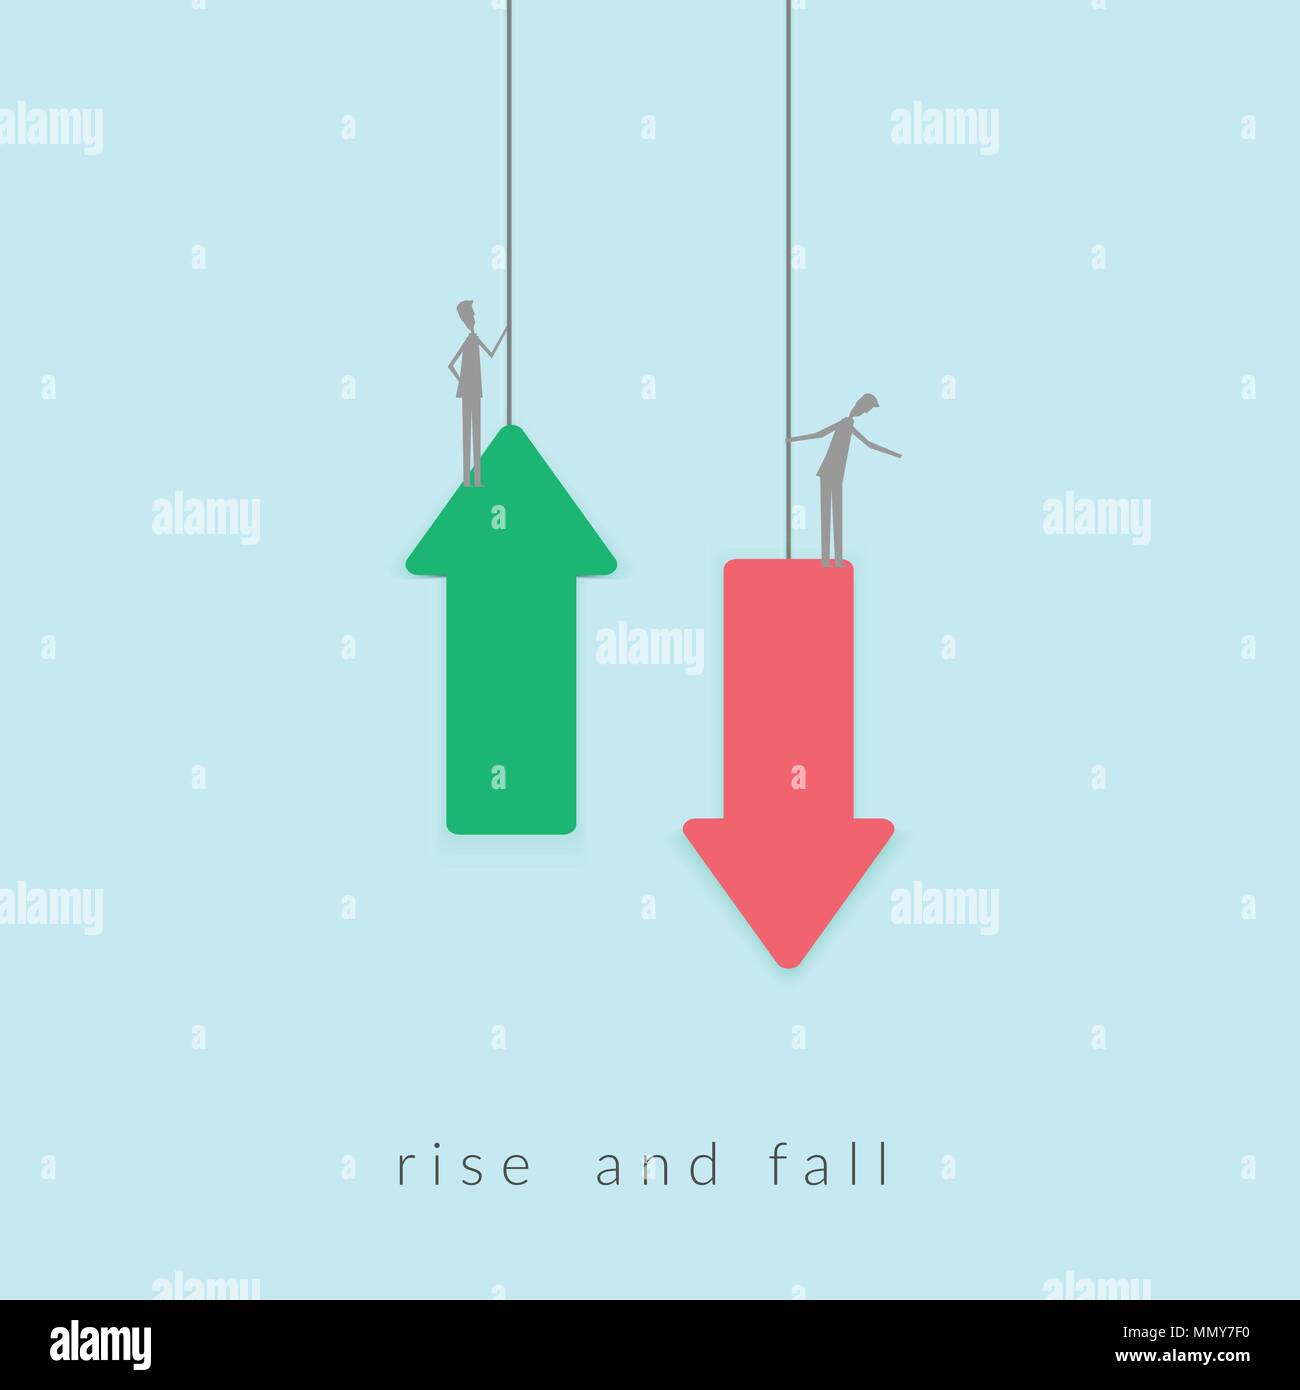 Lift Indicator Stock Photos & Lift Indicator Stock Images - Alamy